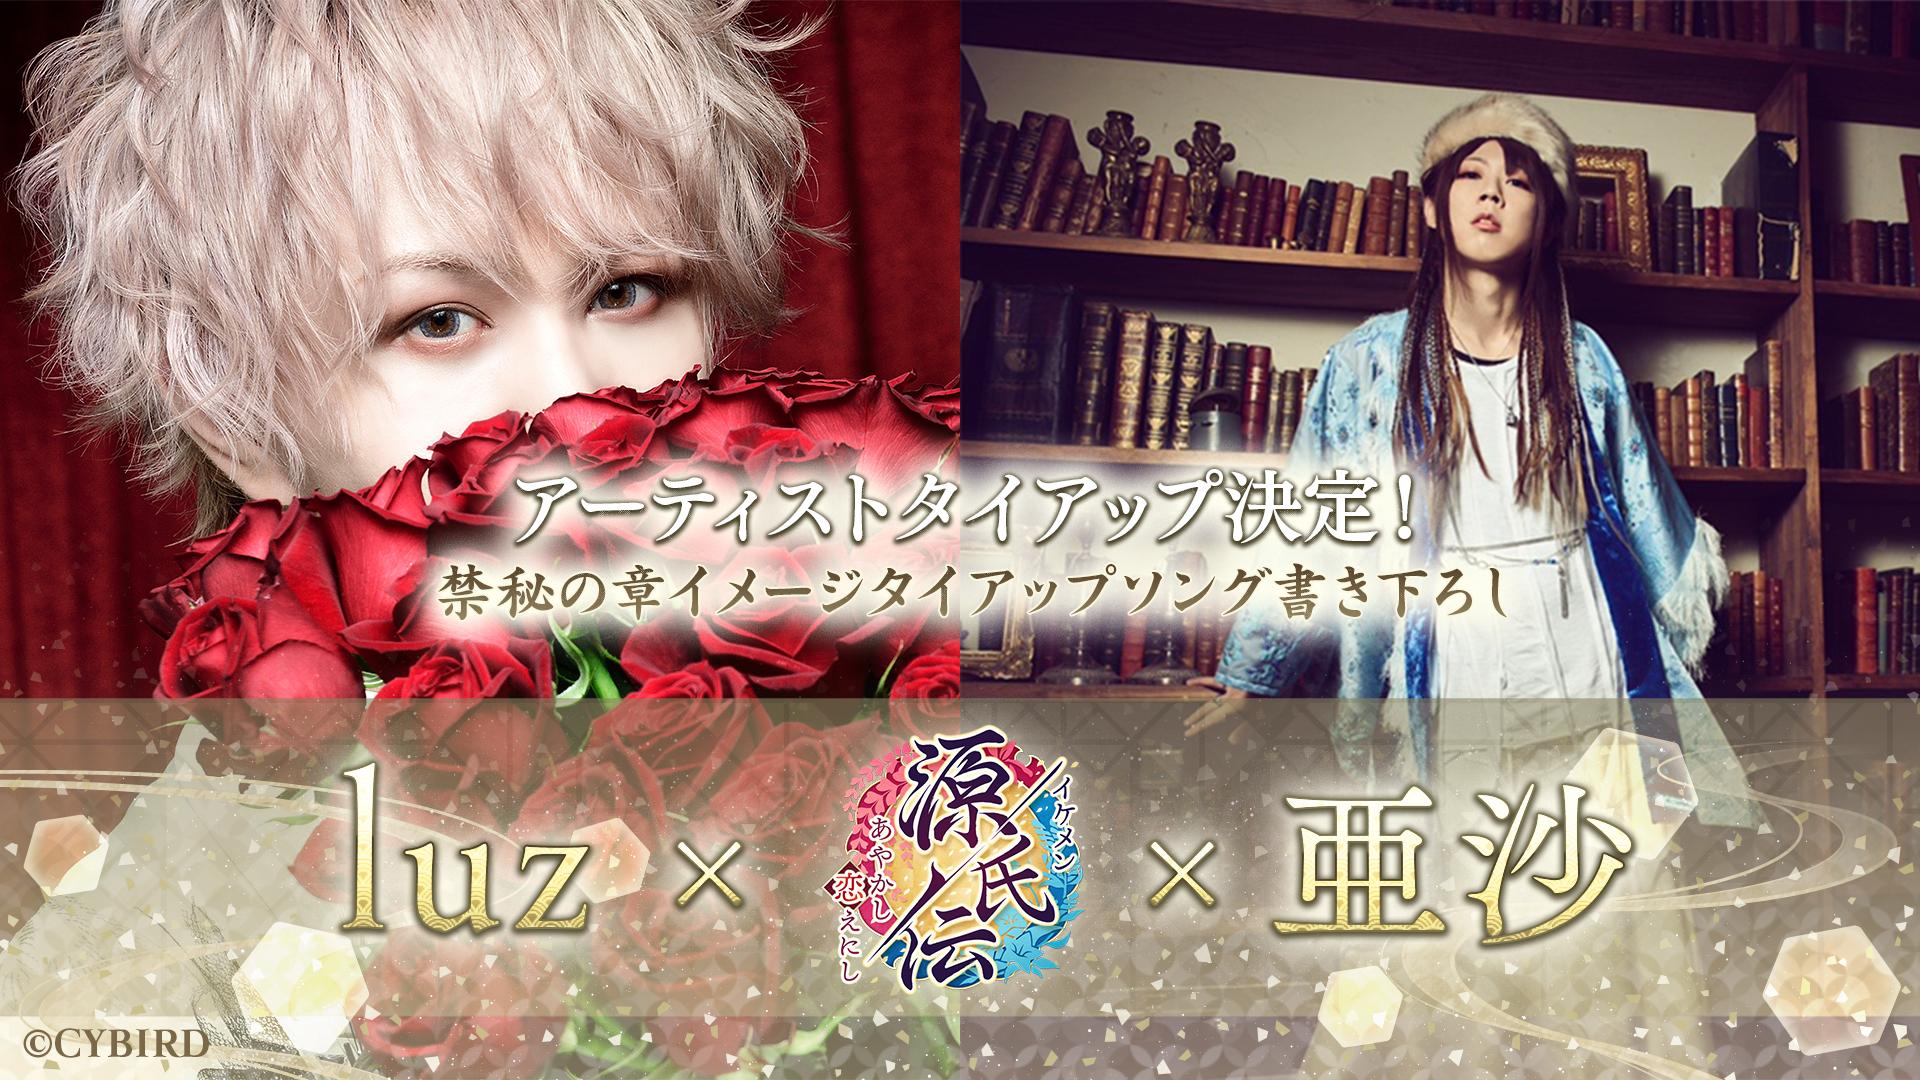 luzとのタイアップソング「紡縁-bouen-feat.亜沙」を初公開! ~タイアップを記念したTwitterキャンペーンも実施~